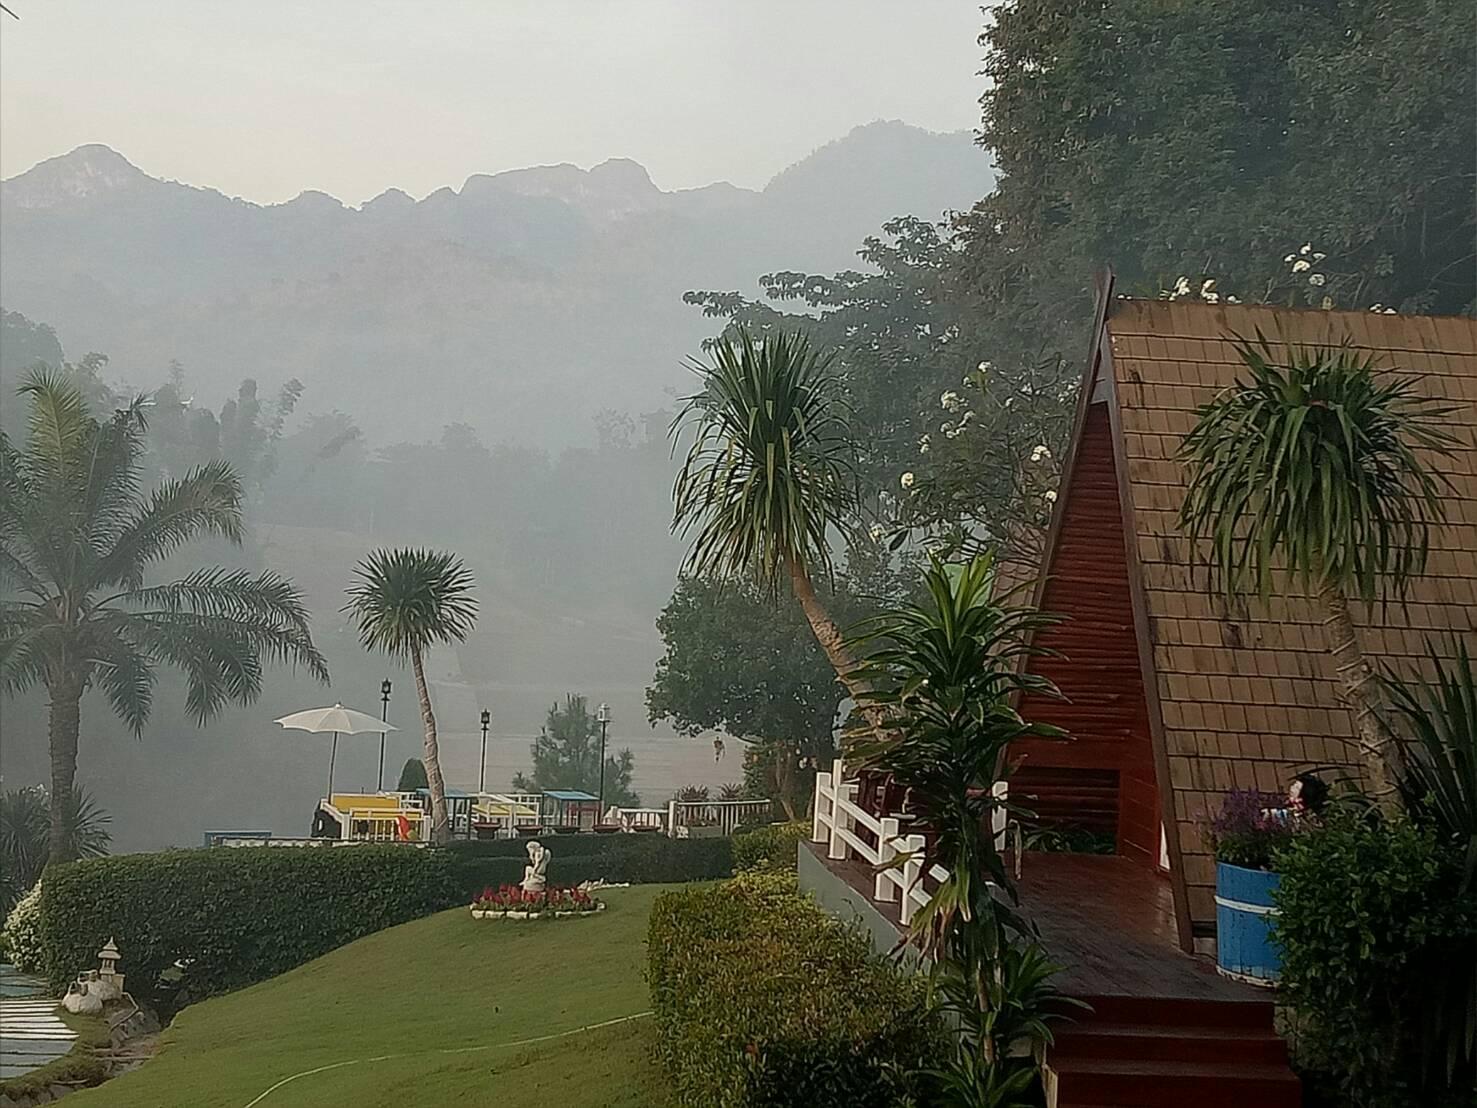 Goodview Resort and Camping กู๊ดวิว รีสอร์ต แอนด์ แคมปิ้ง